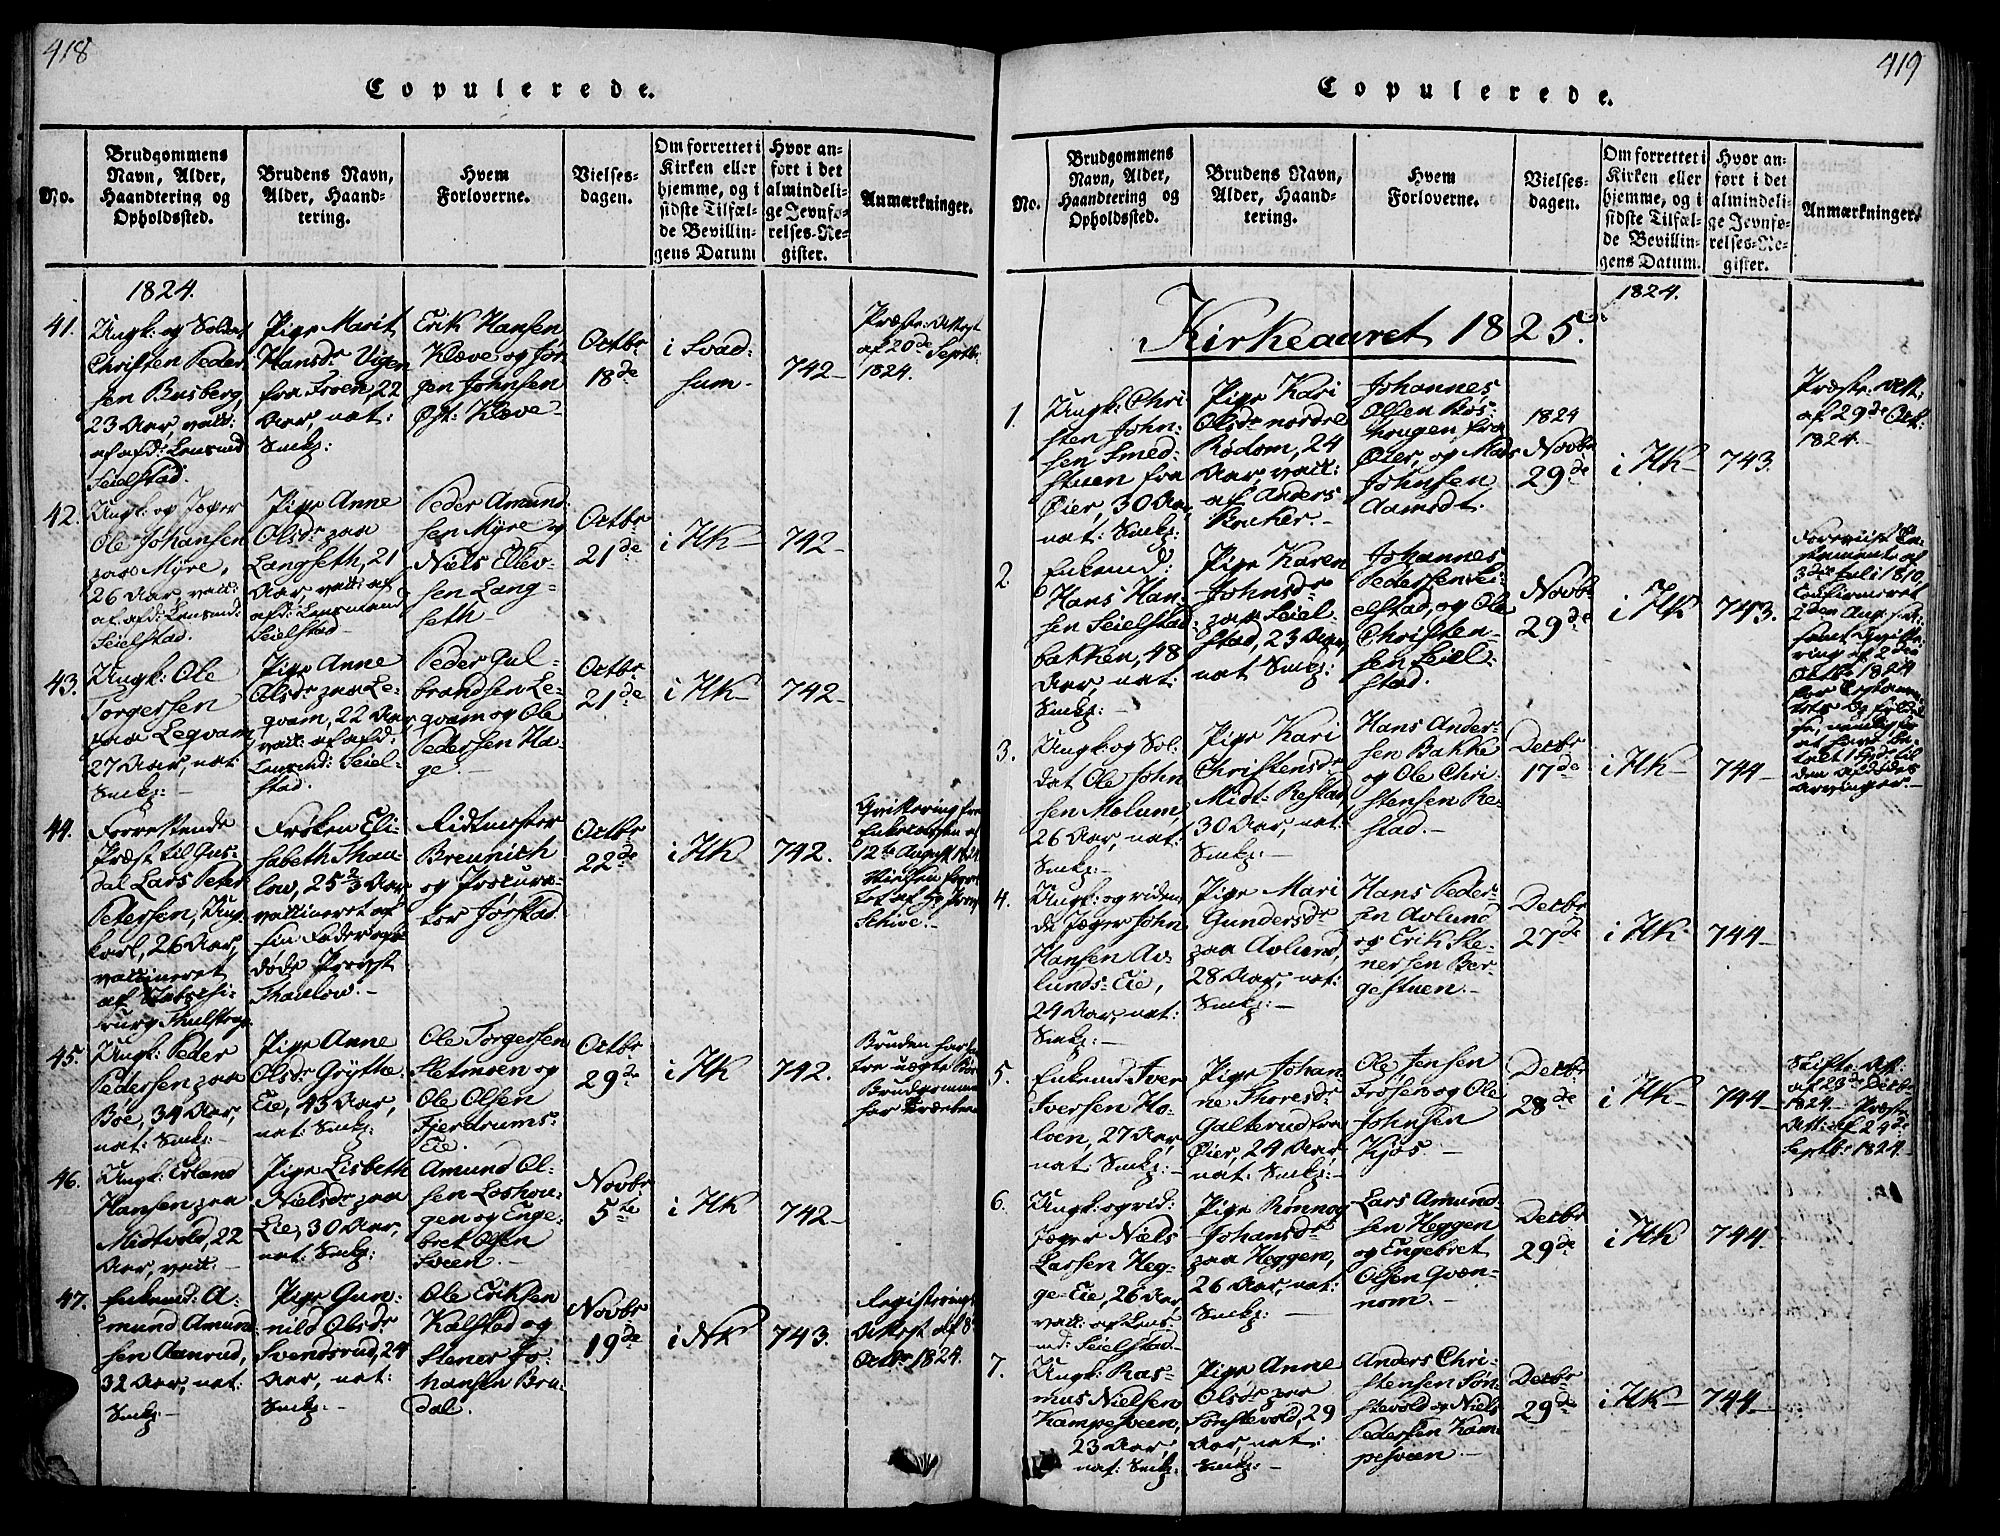 SAH, Gausdal prestekontor, Ministerialbok nr. 5, 1817-1829, s. 418-419